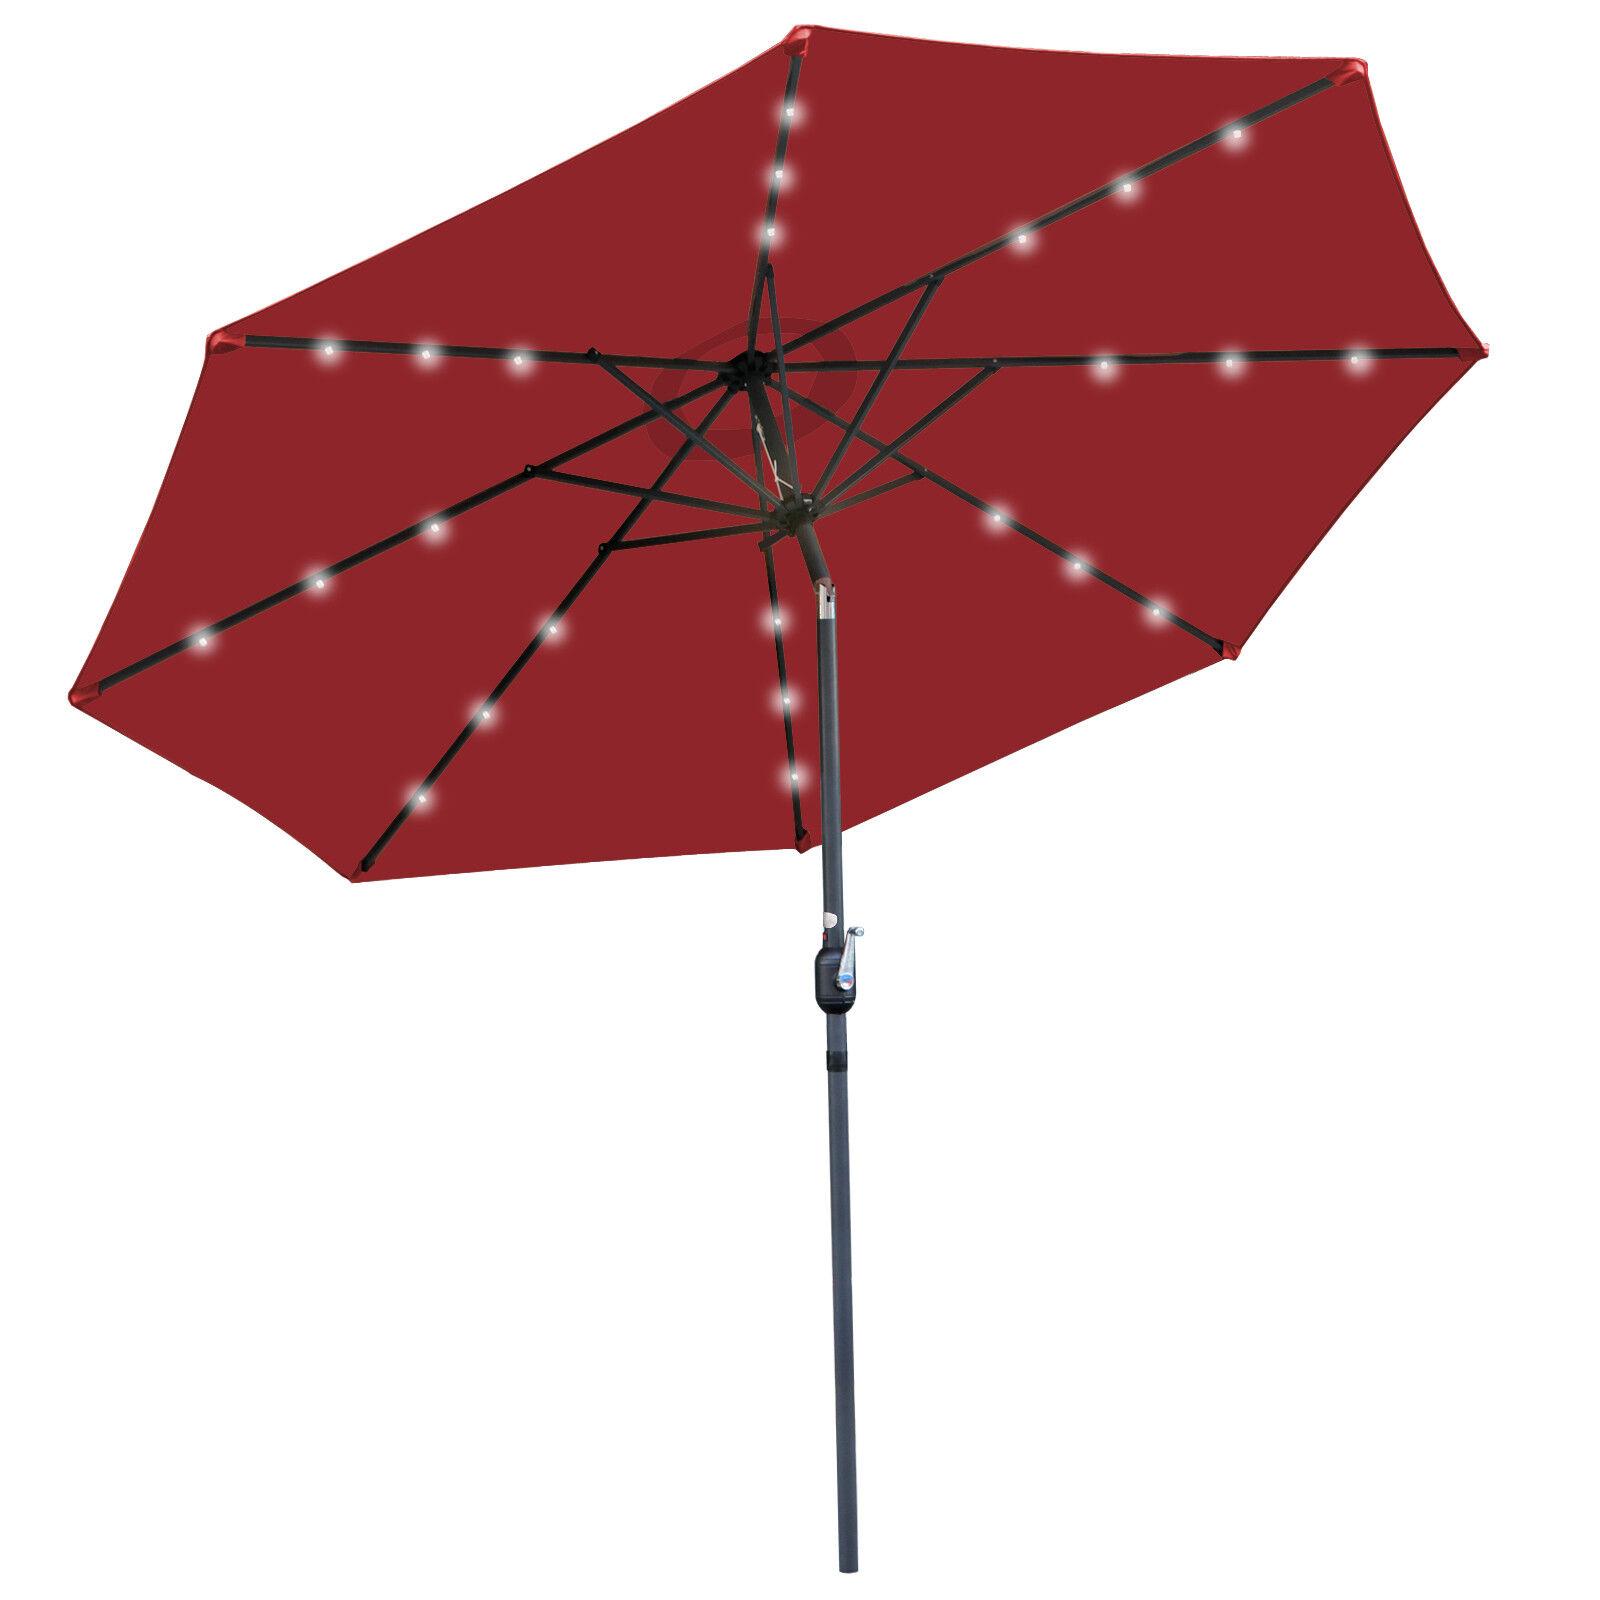 10′ Hanging Solar LED Umbrella Patio Sun Shade Offset Market Burgundy Garden Structures & Shade